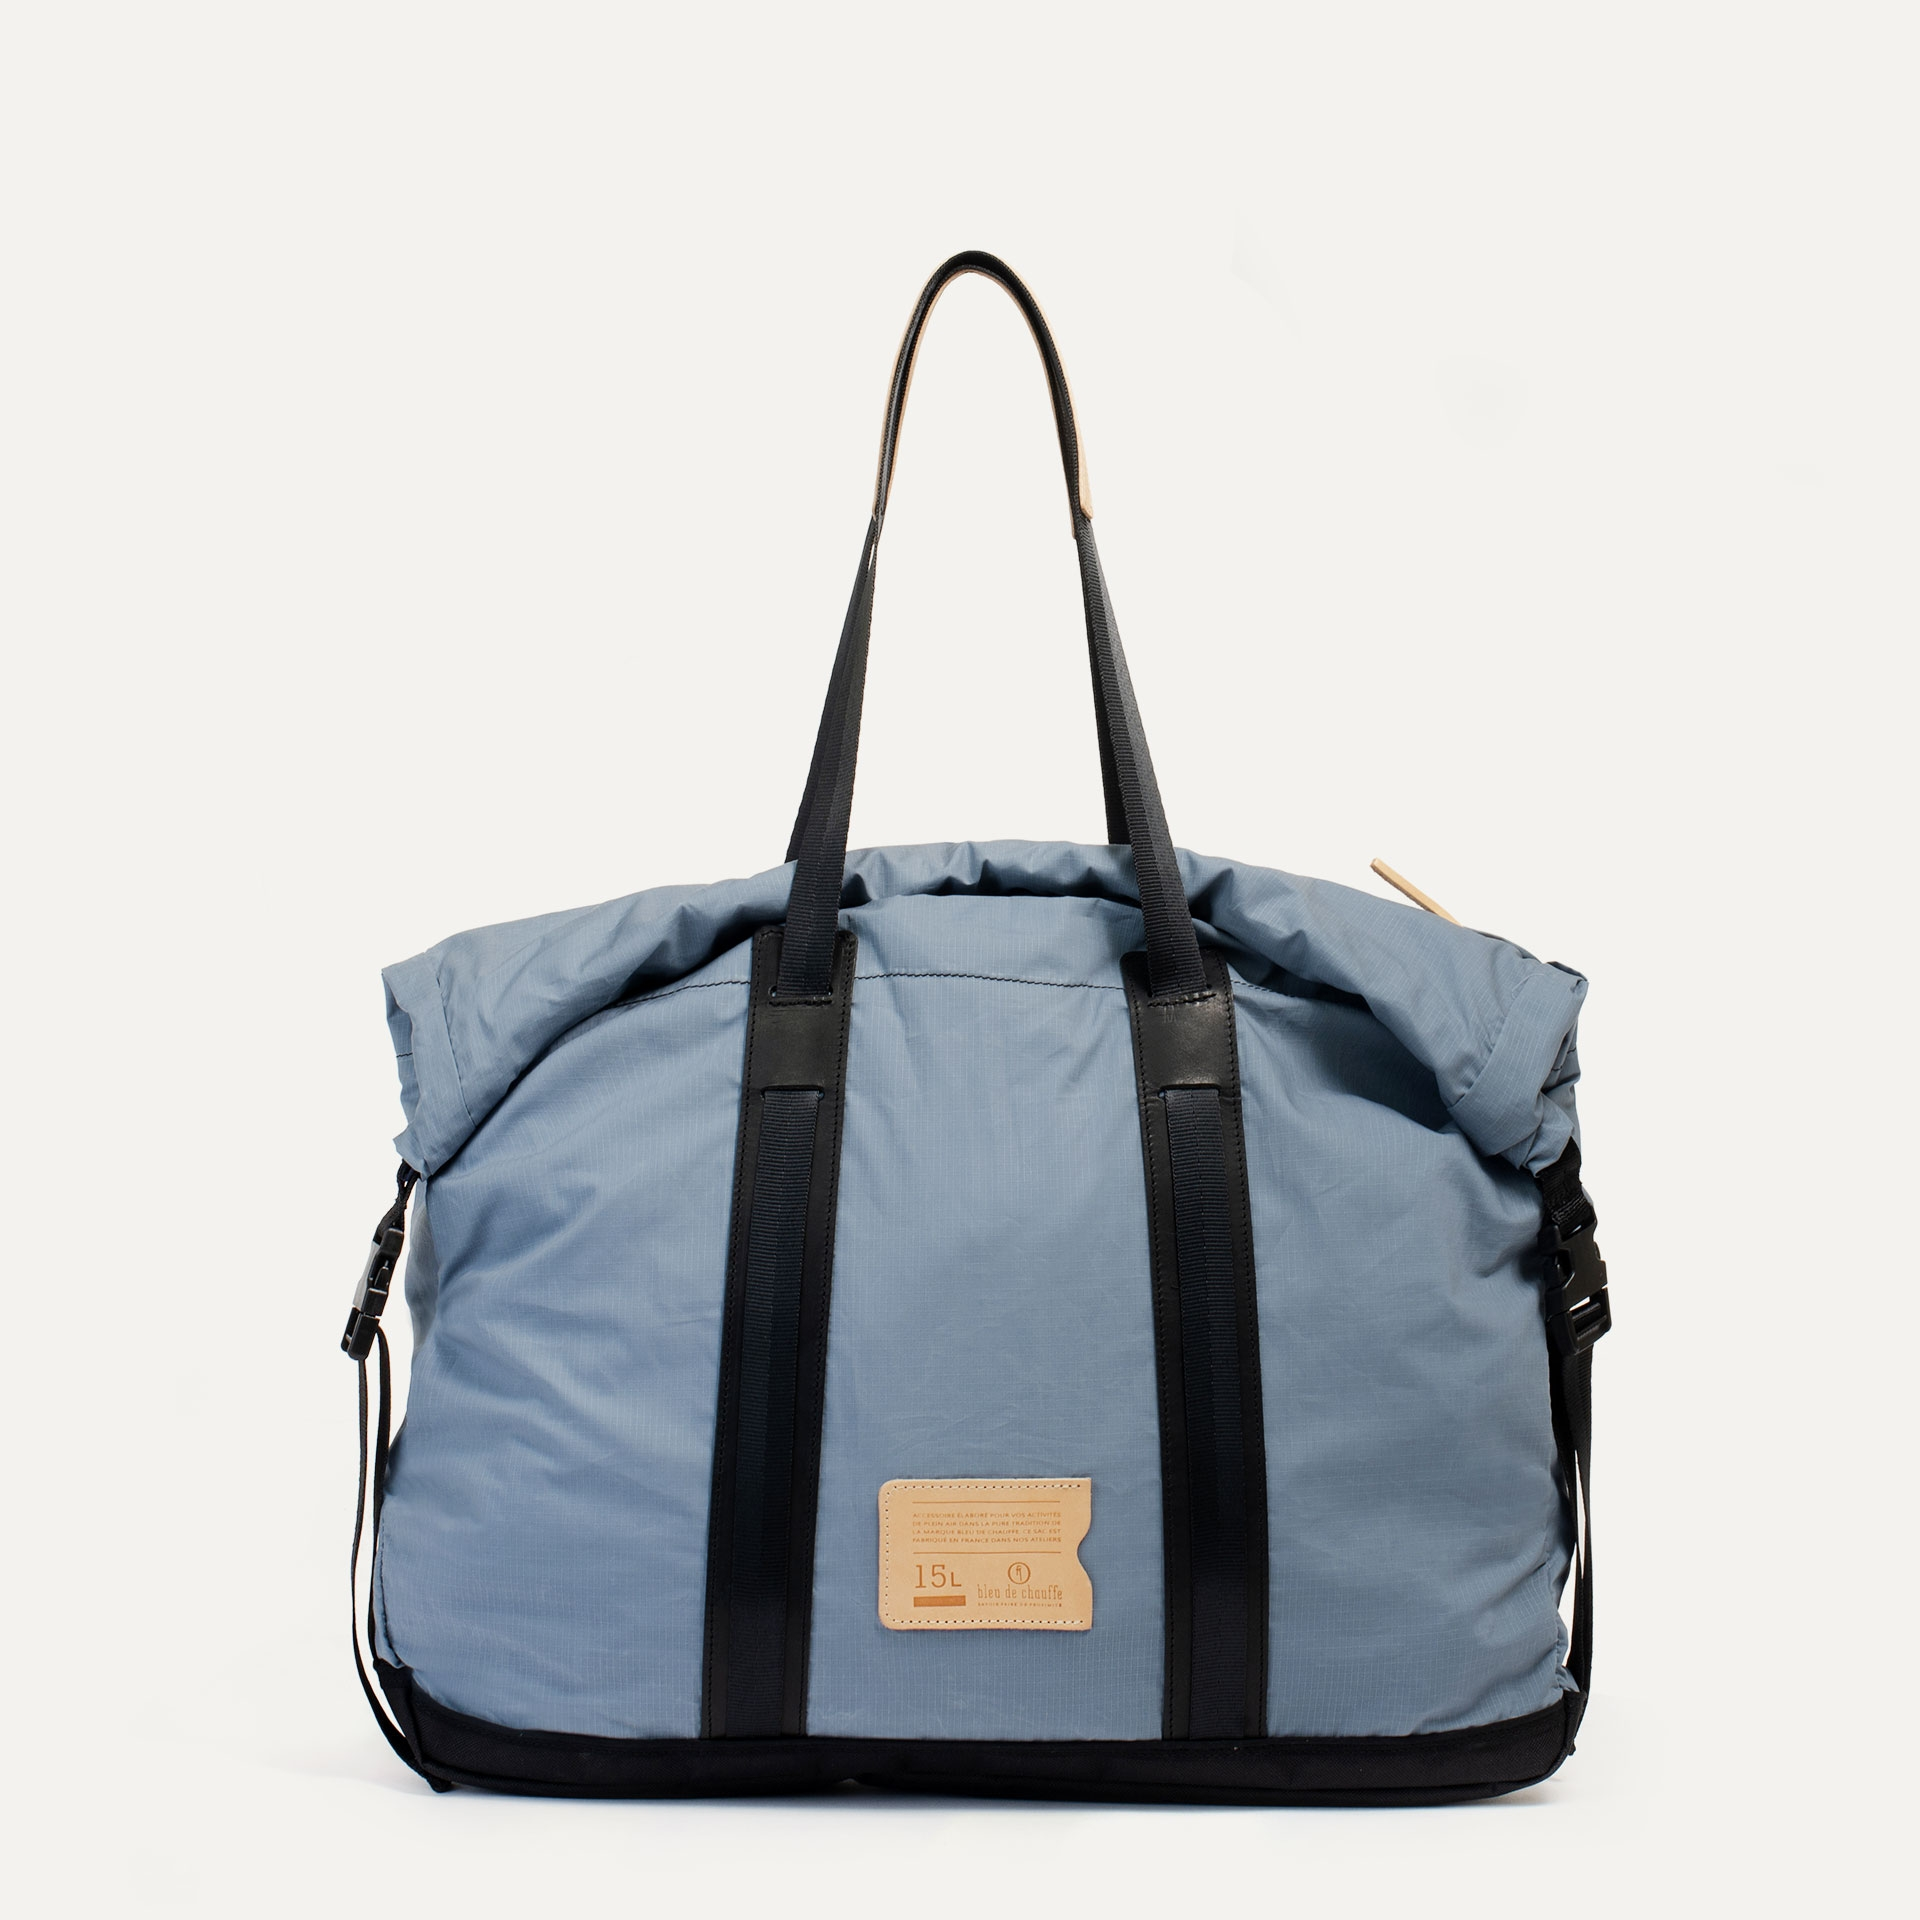 15L Barda Tote bag - blue grey (image n°1)